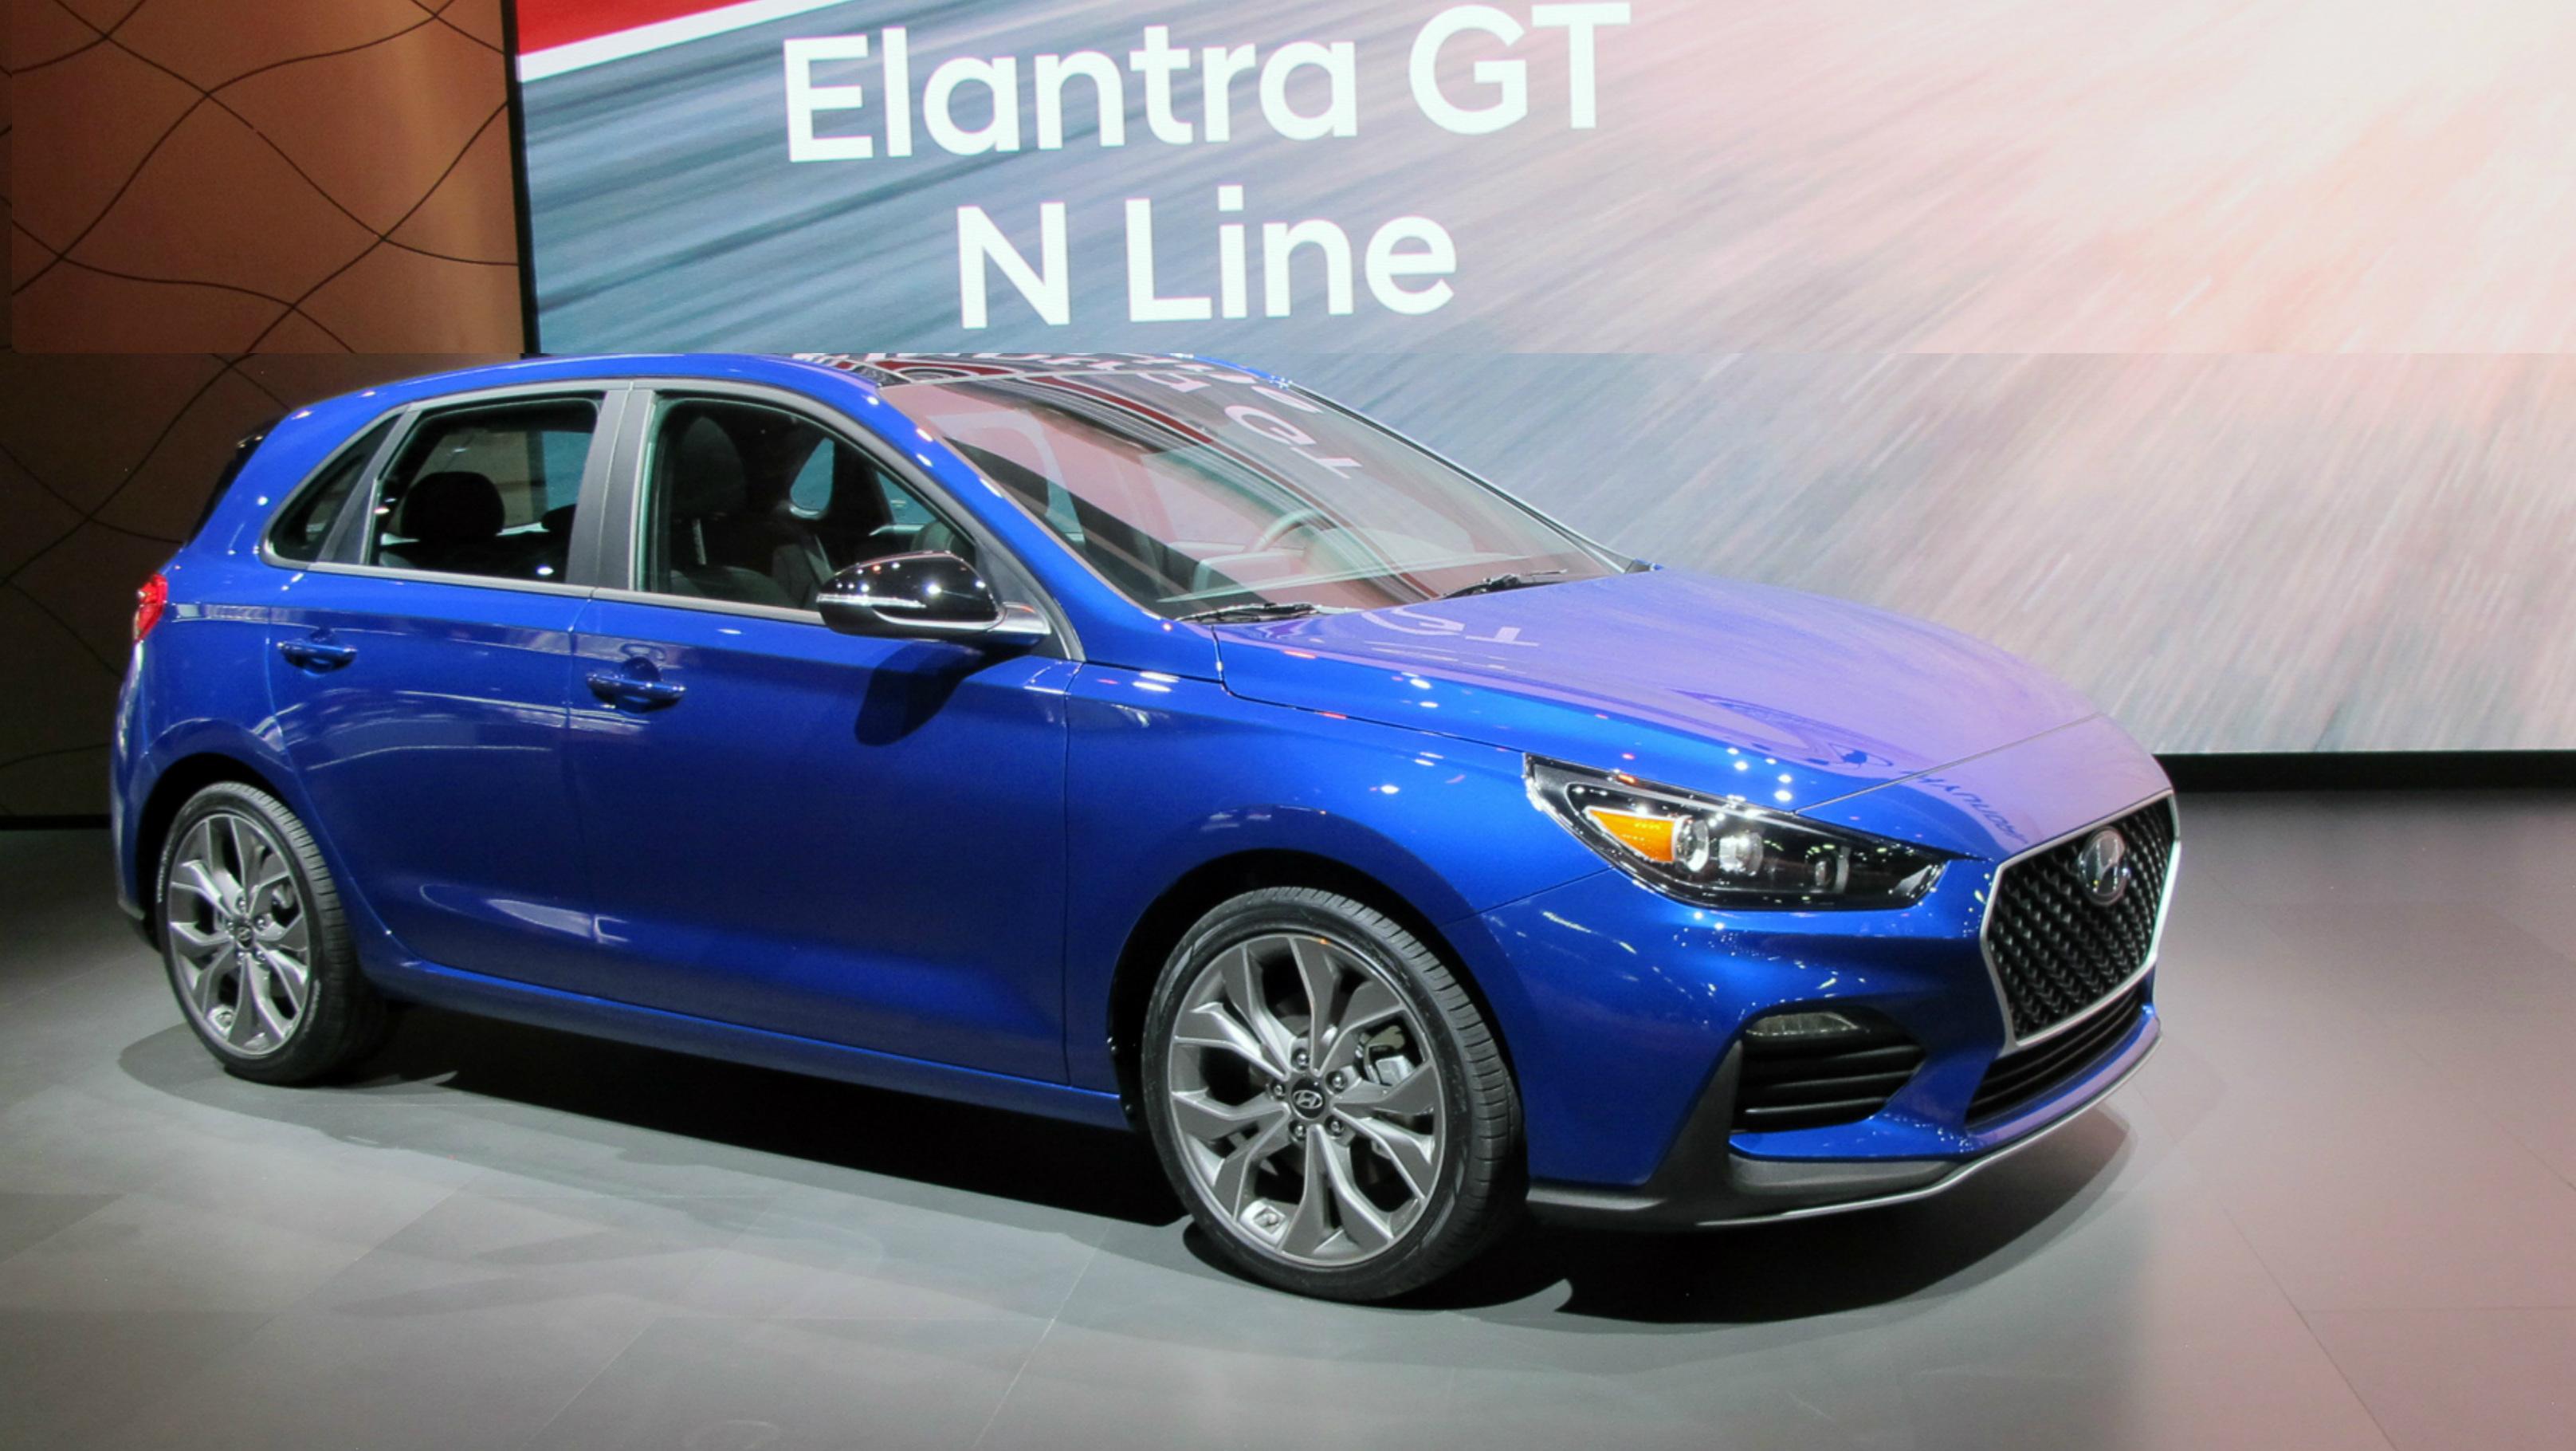 Hyundai Elantra GT N Line coming to AutoShow